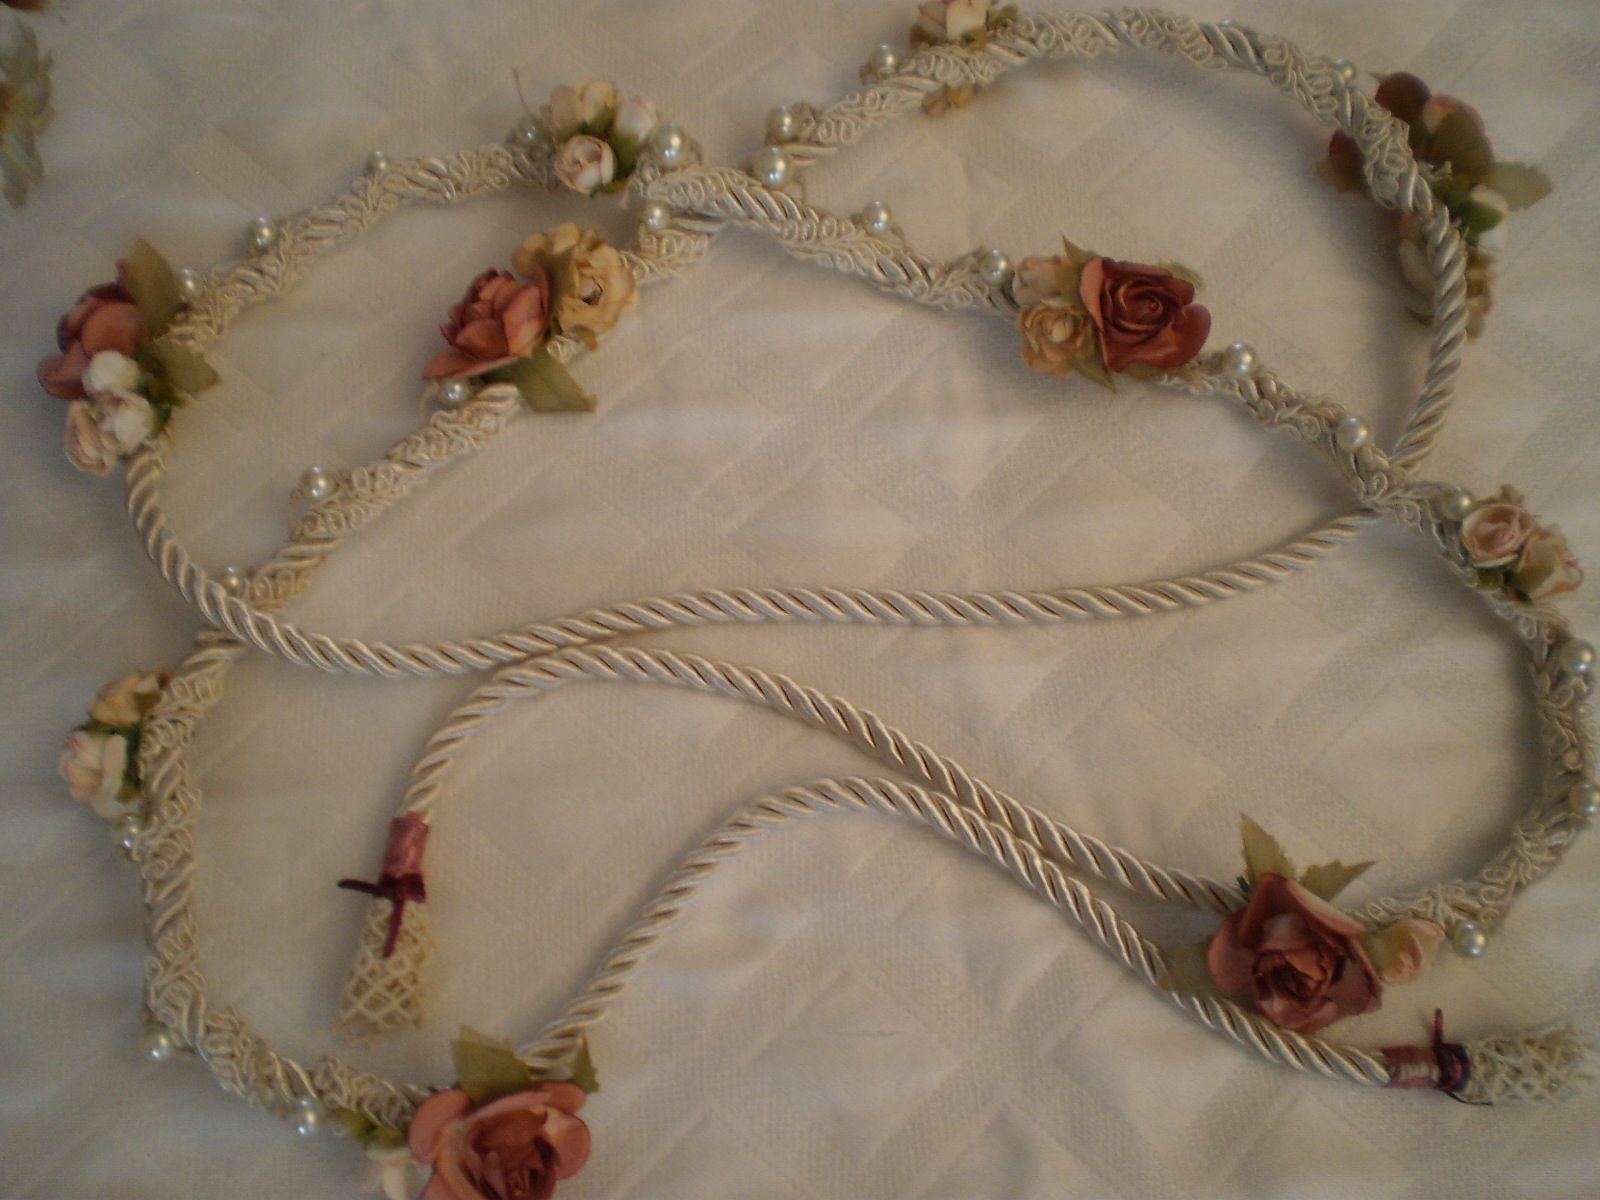 Ideas Matrimonio Simbolico : Lazo de flores para el ritual atadura manos que se